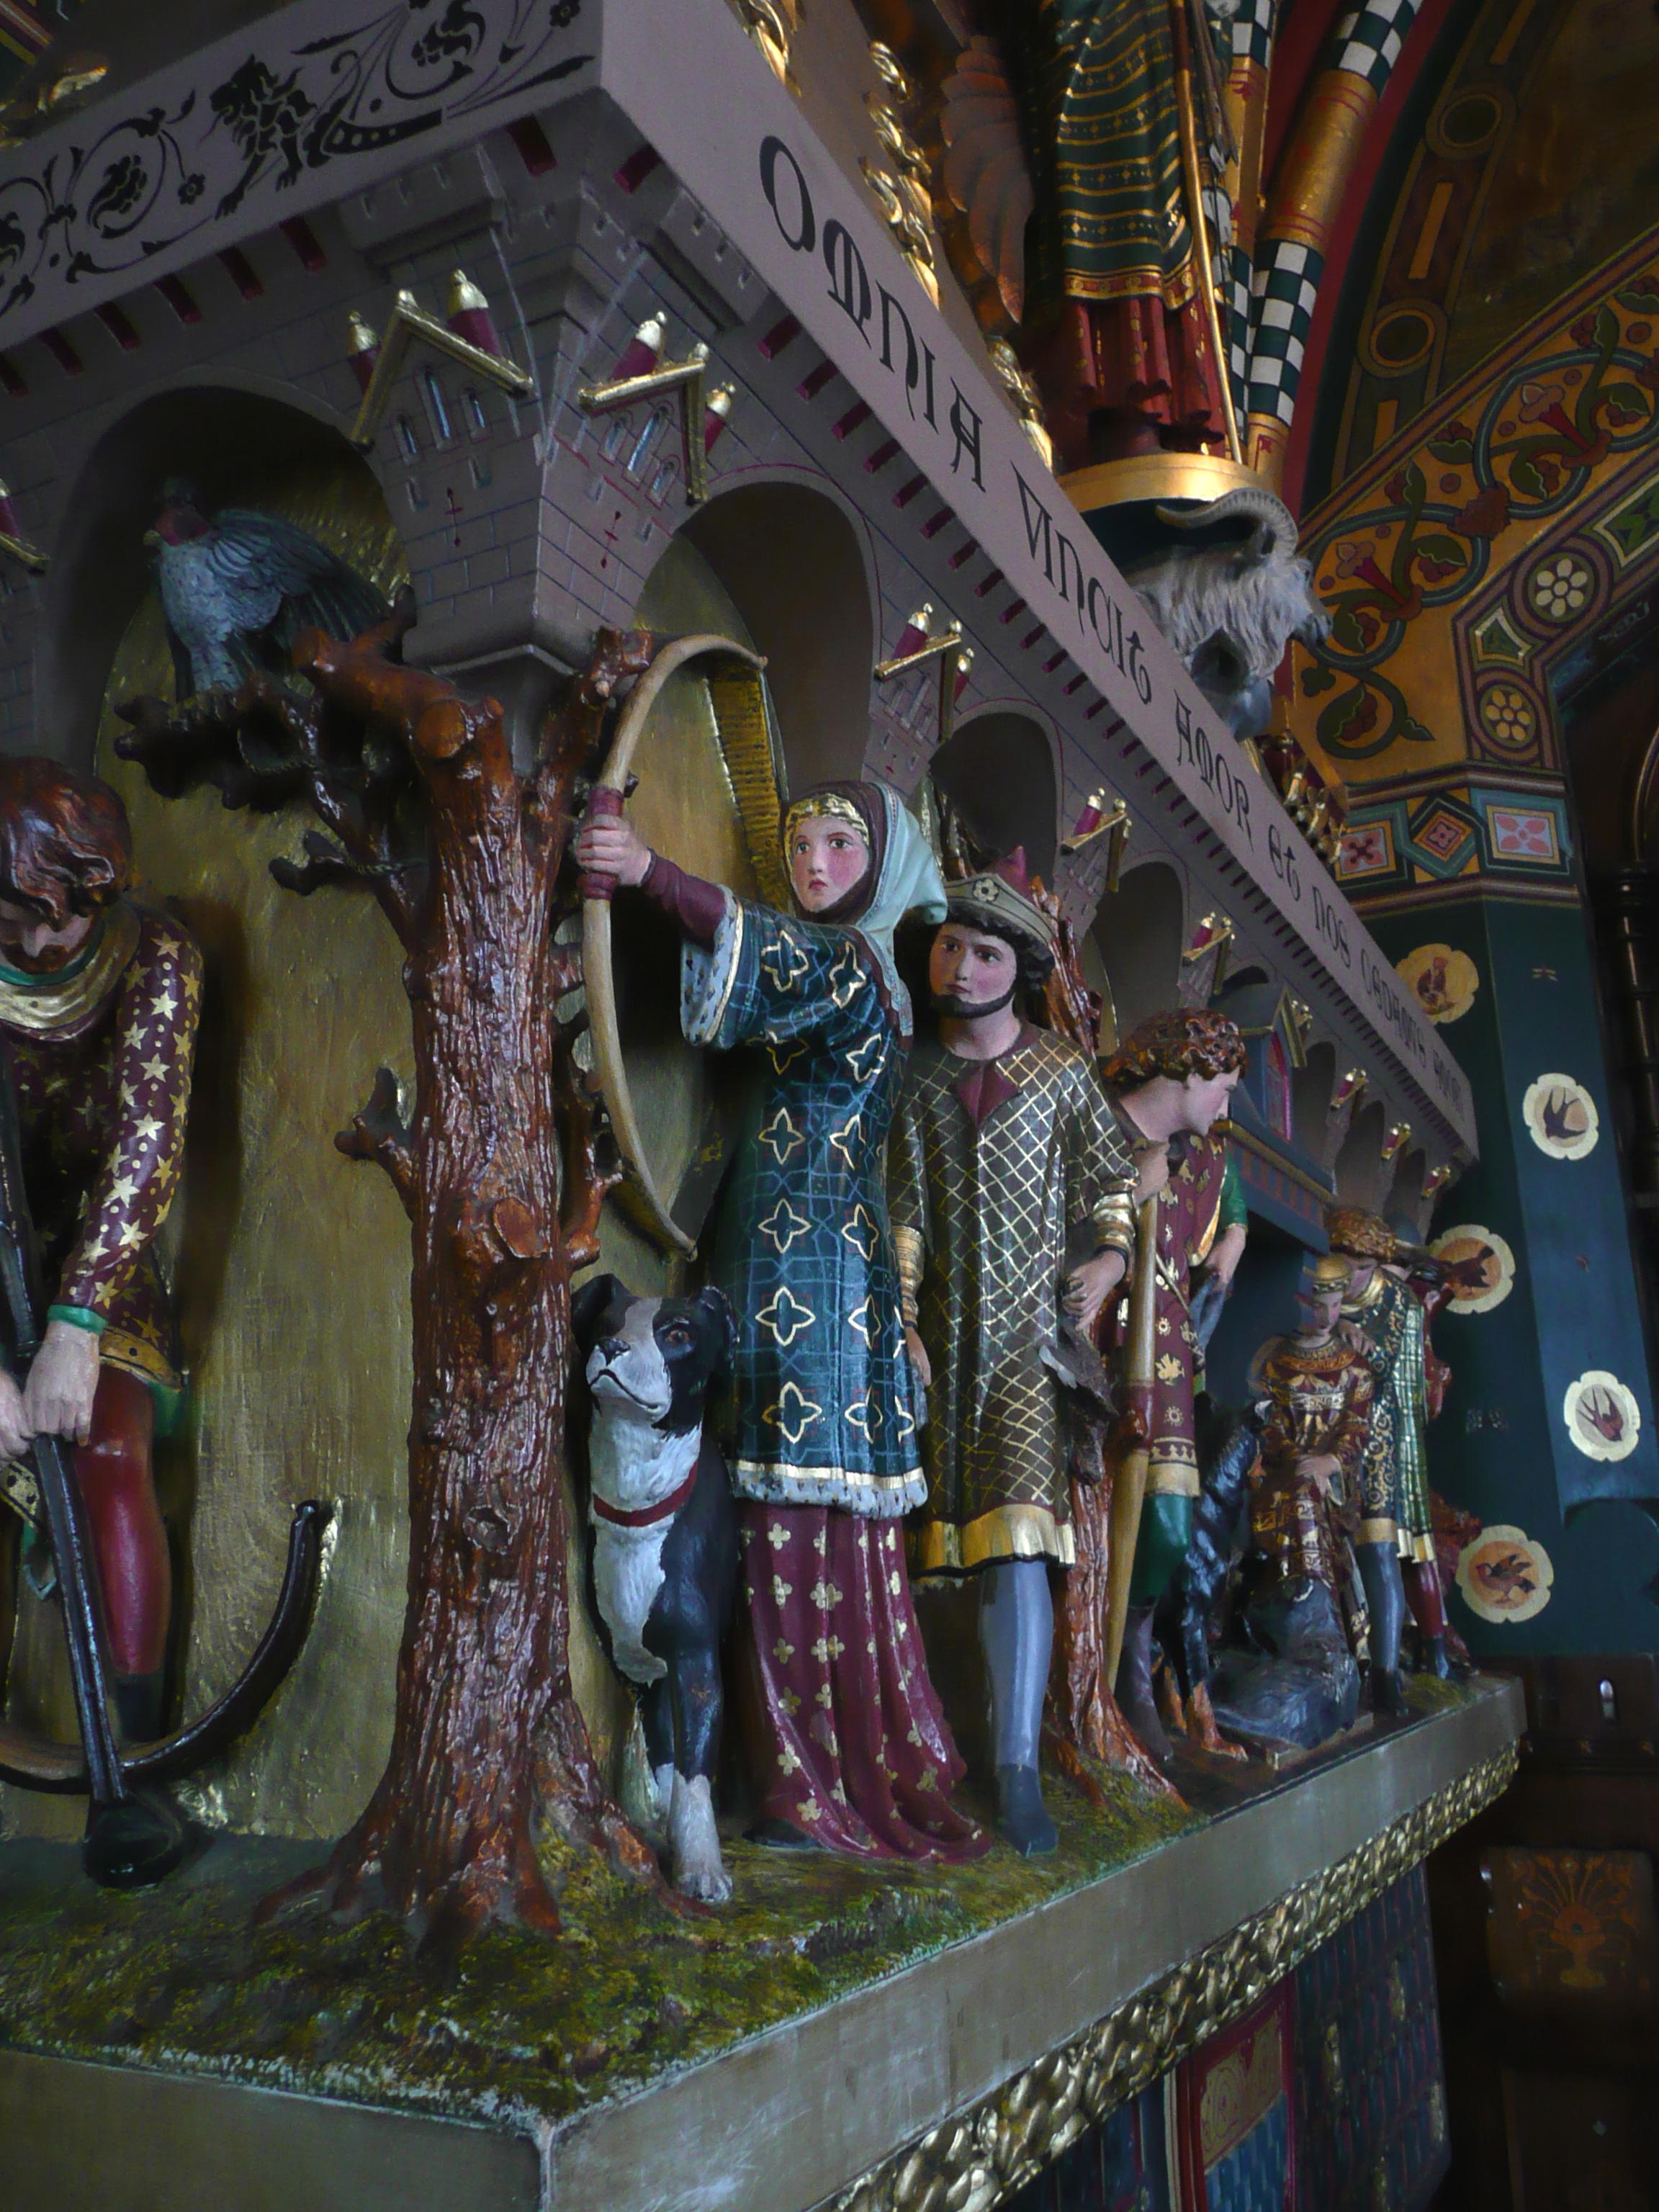 file:cardiff castle fireplace decoration - wikimedia commons